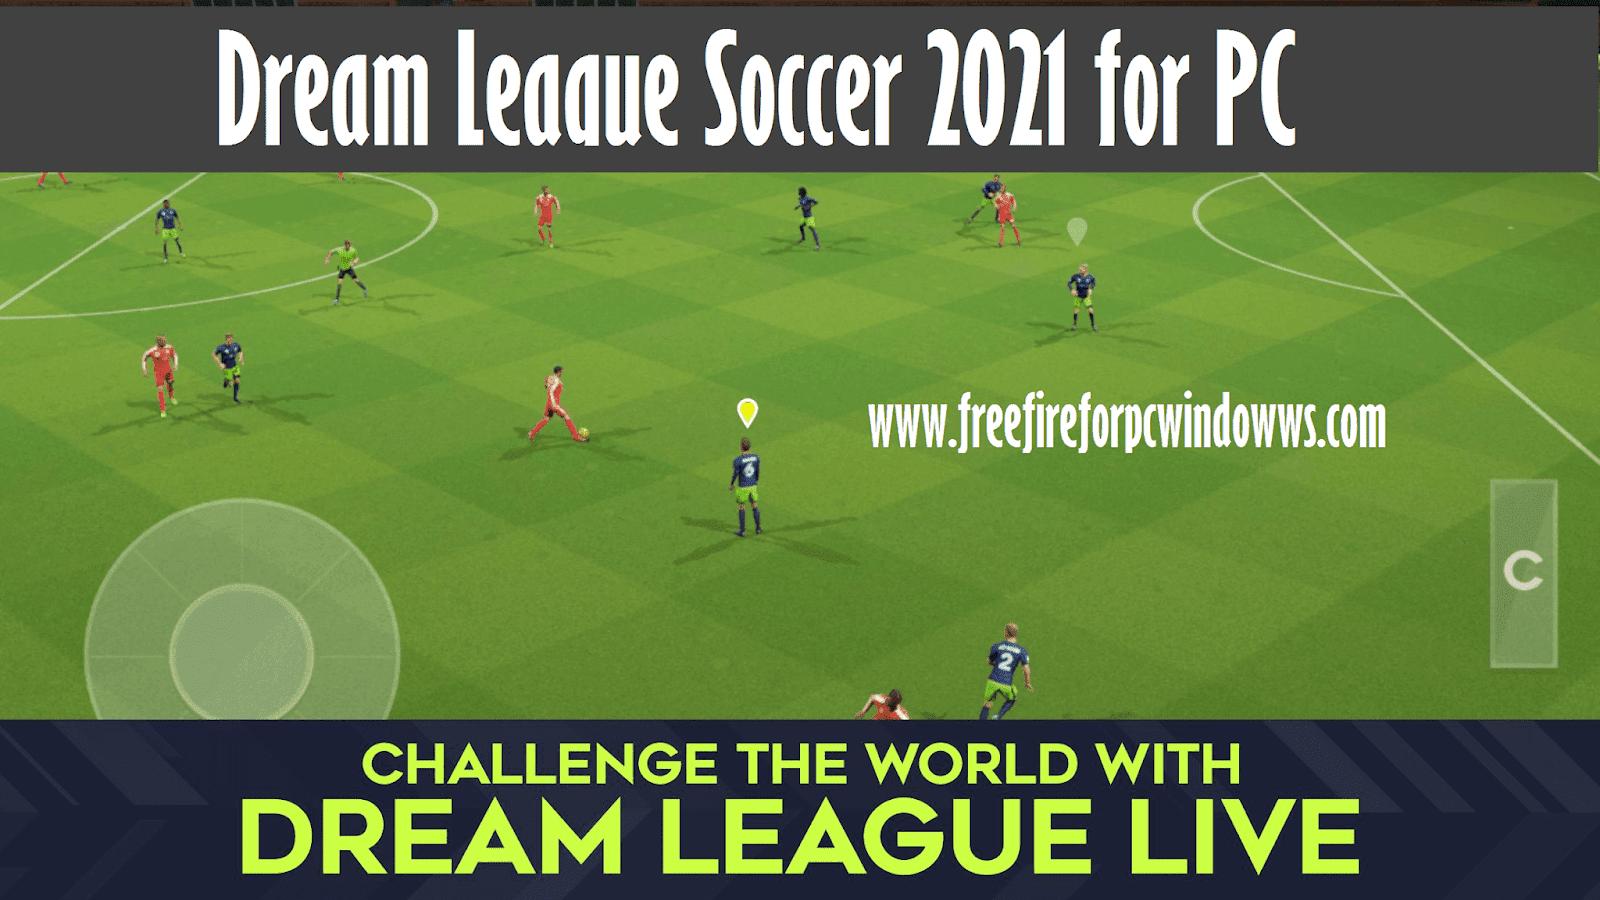 Dream League Soccer 2021 for PC